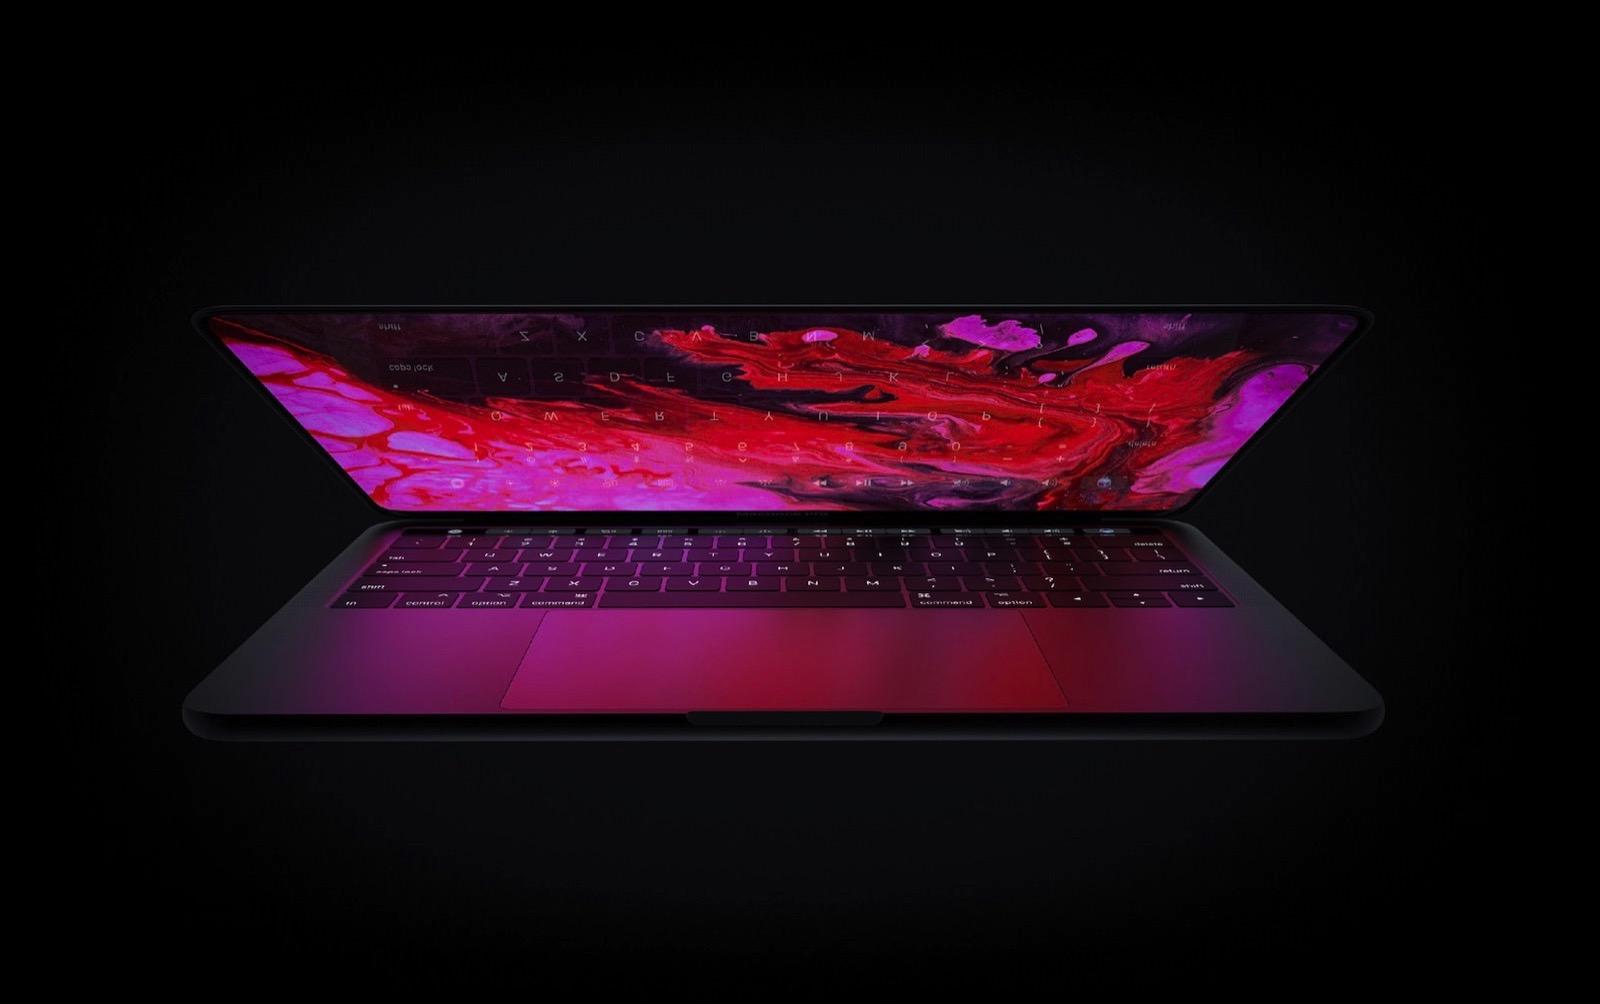 MacBook Pro 2020 concept image